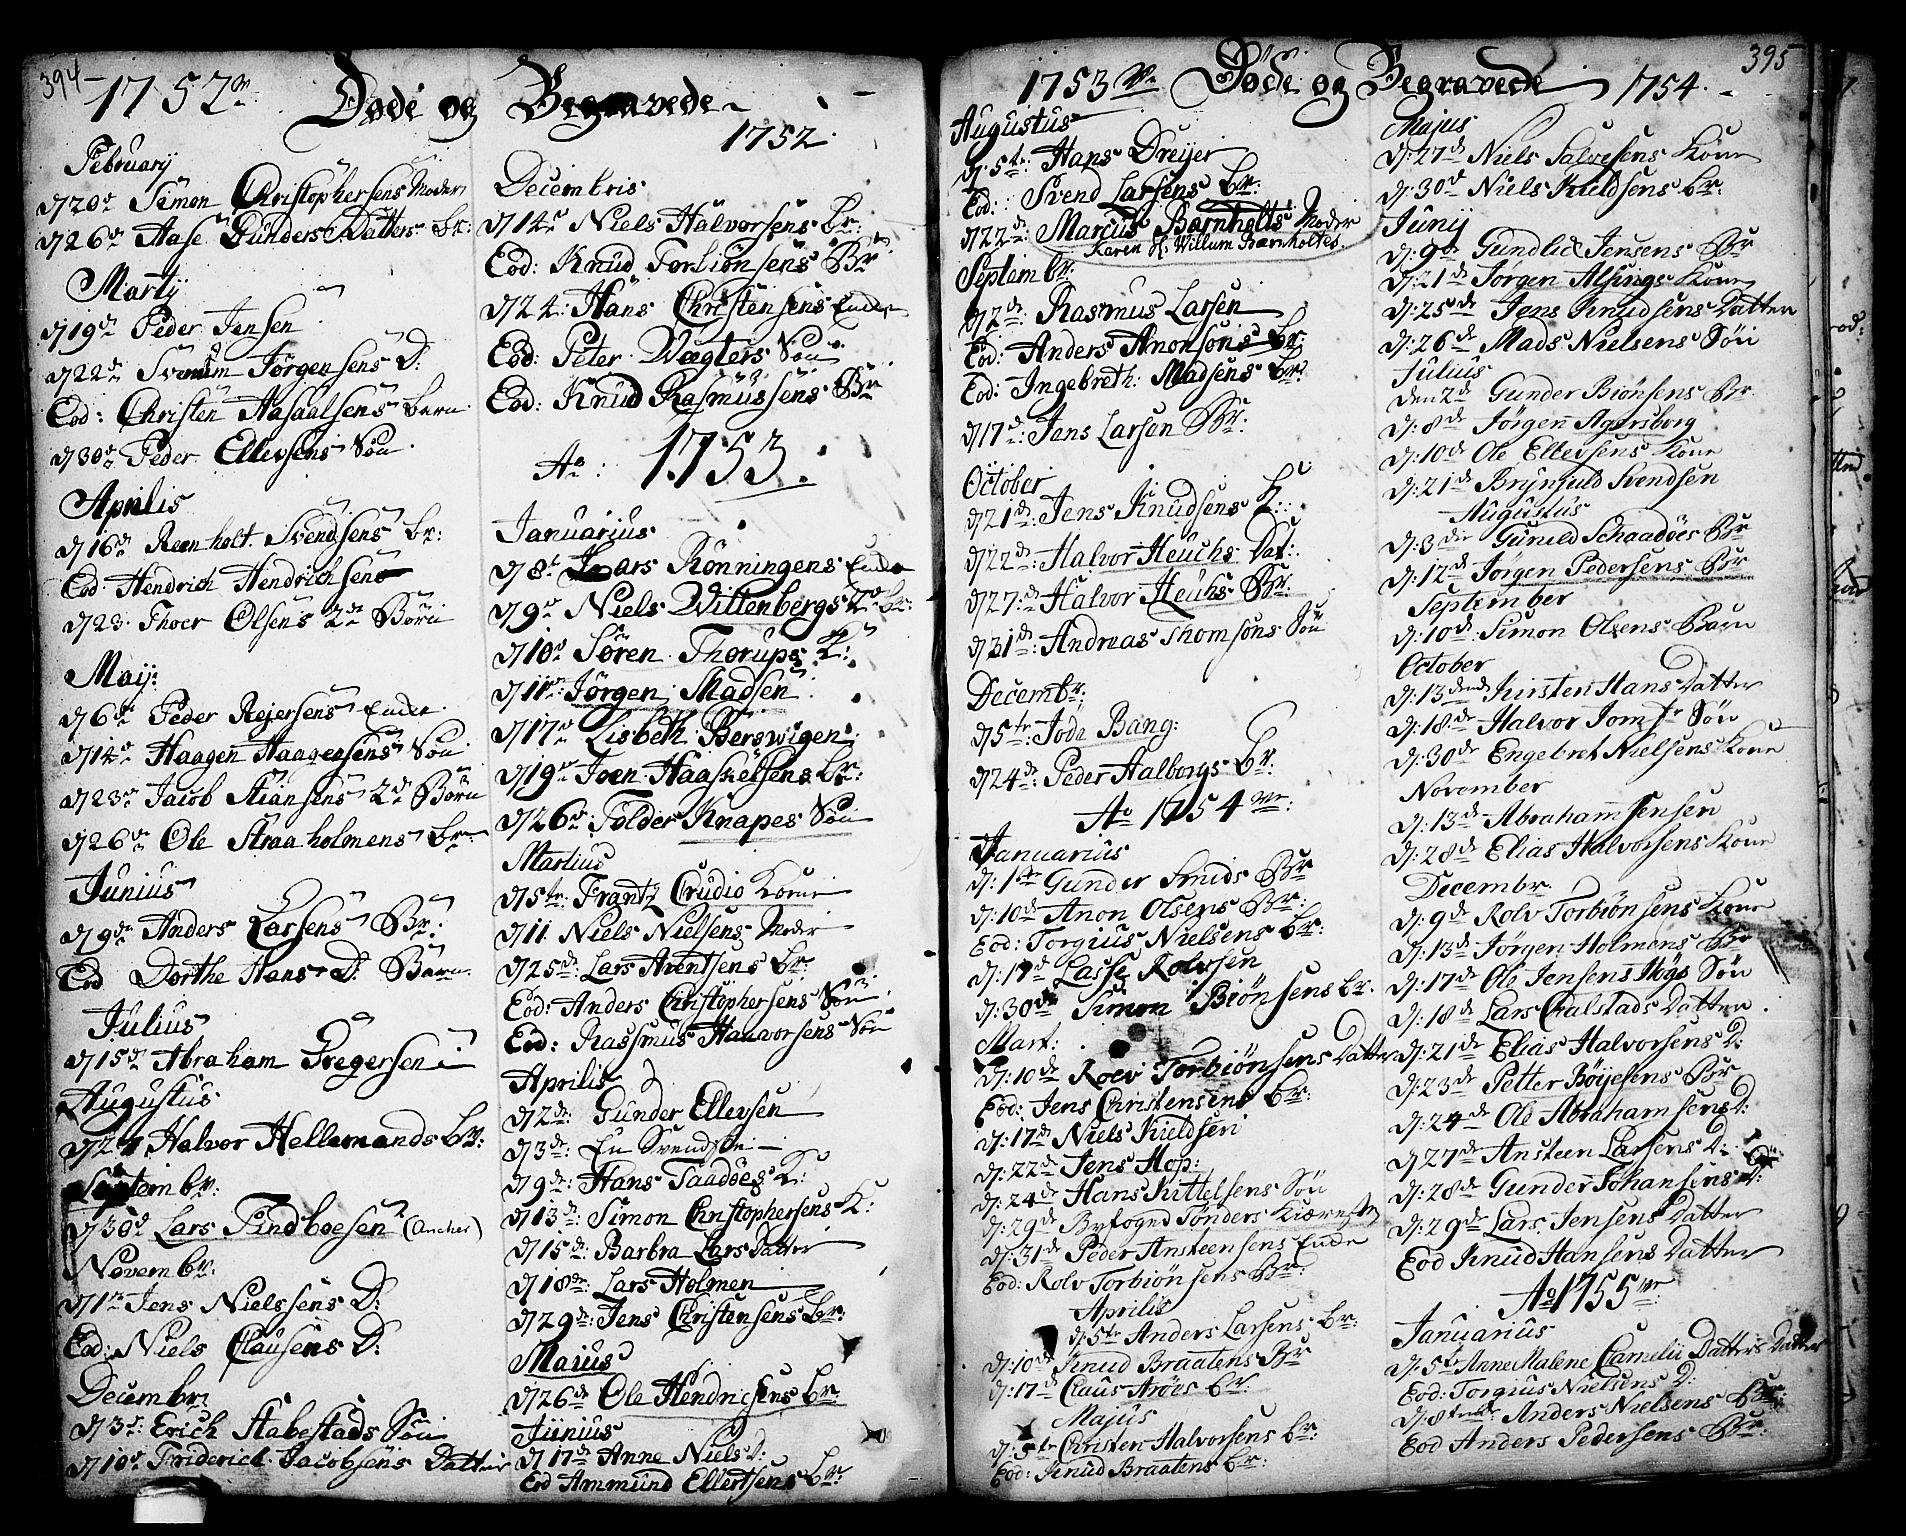 SAKO, Kragerø kirkebøker, F/Fa/L0001: Ministerialbok nr. 1, 1702-1766, s. 394-395